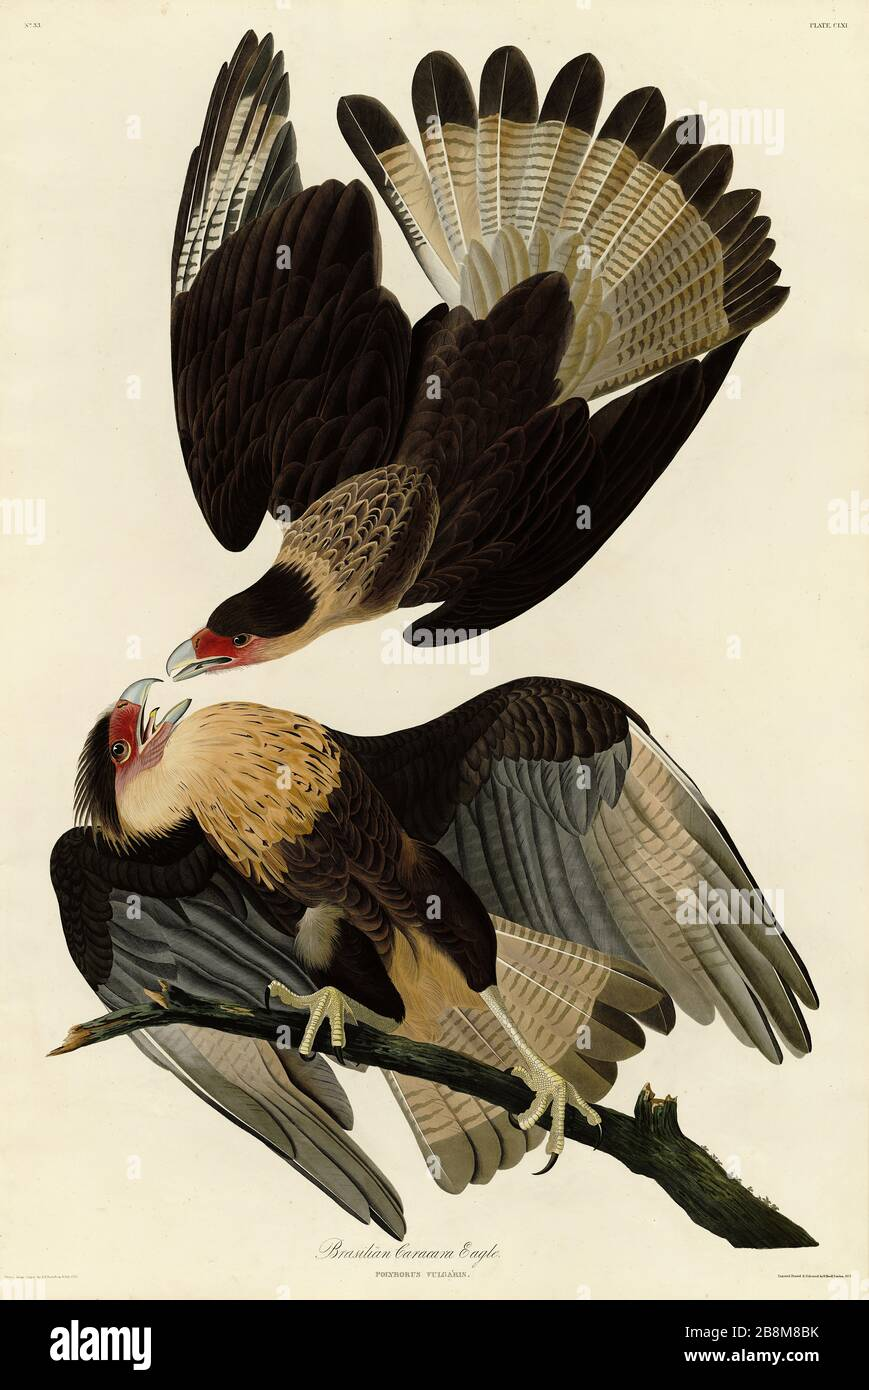 American Bald Eagle USA Ornithology Natural History Bird Lithograph Print 1910s Germany Illustration To Frame